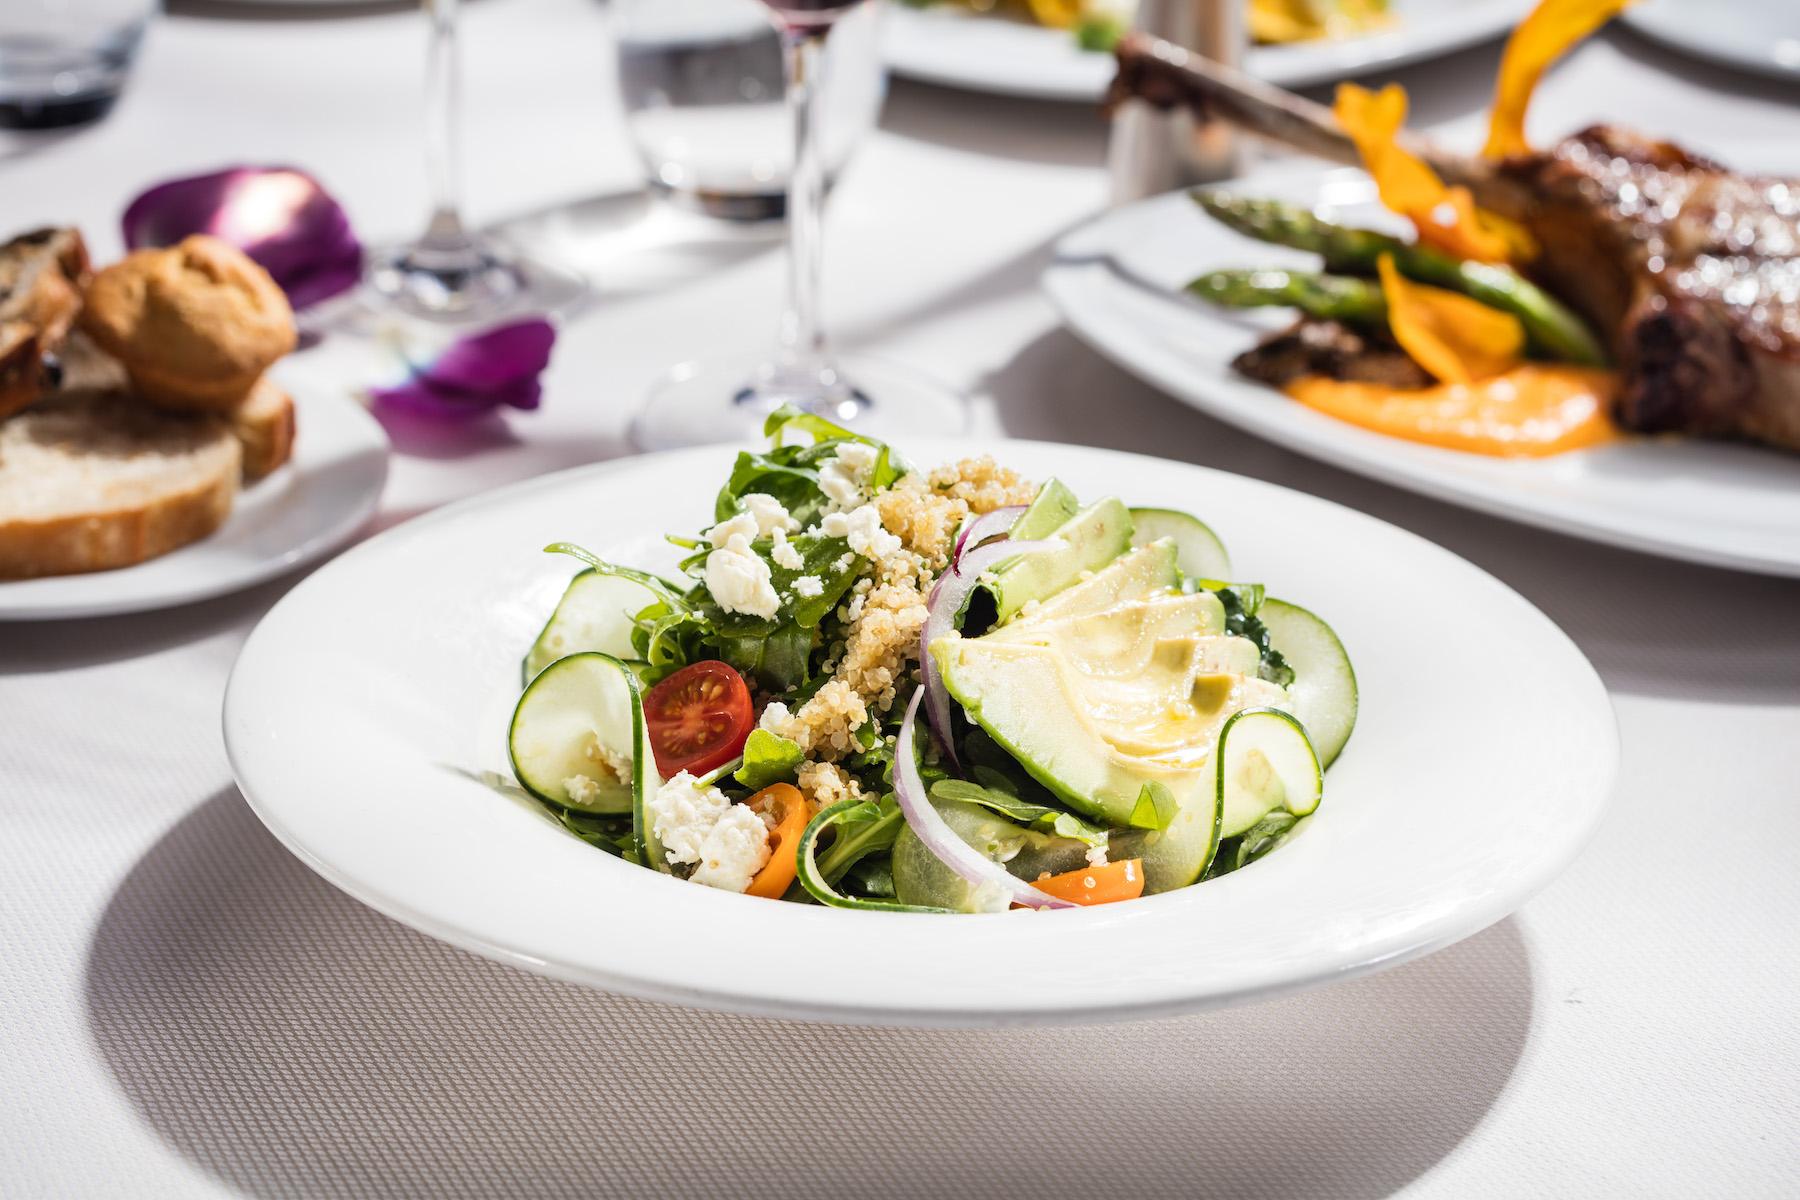 Unique Quinoa and Kale Salad